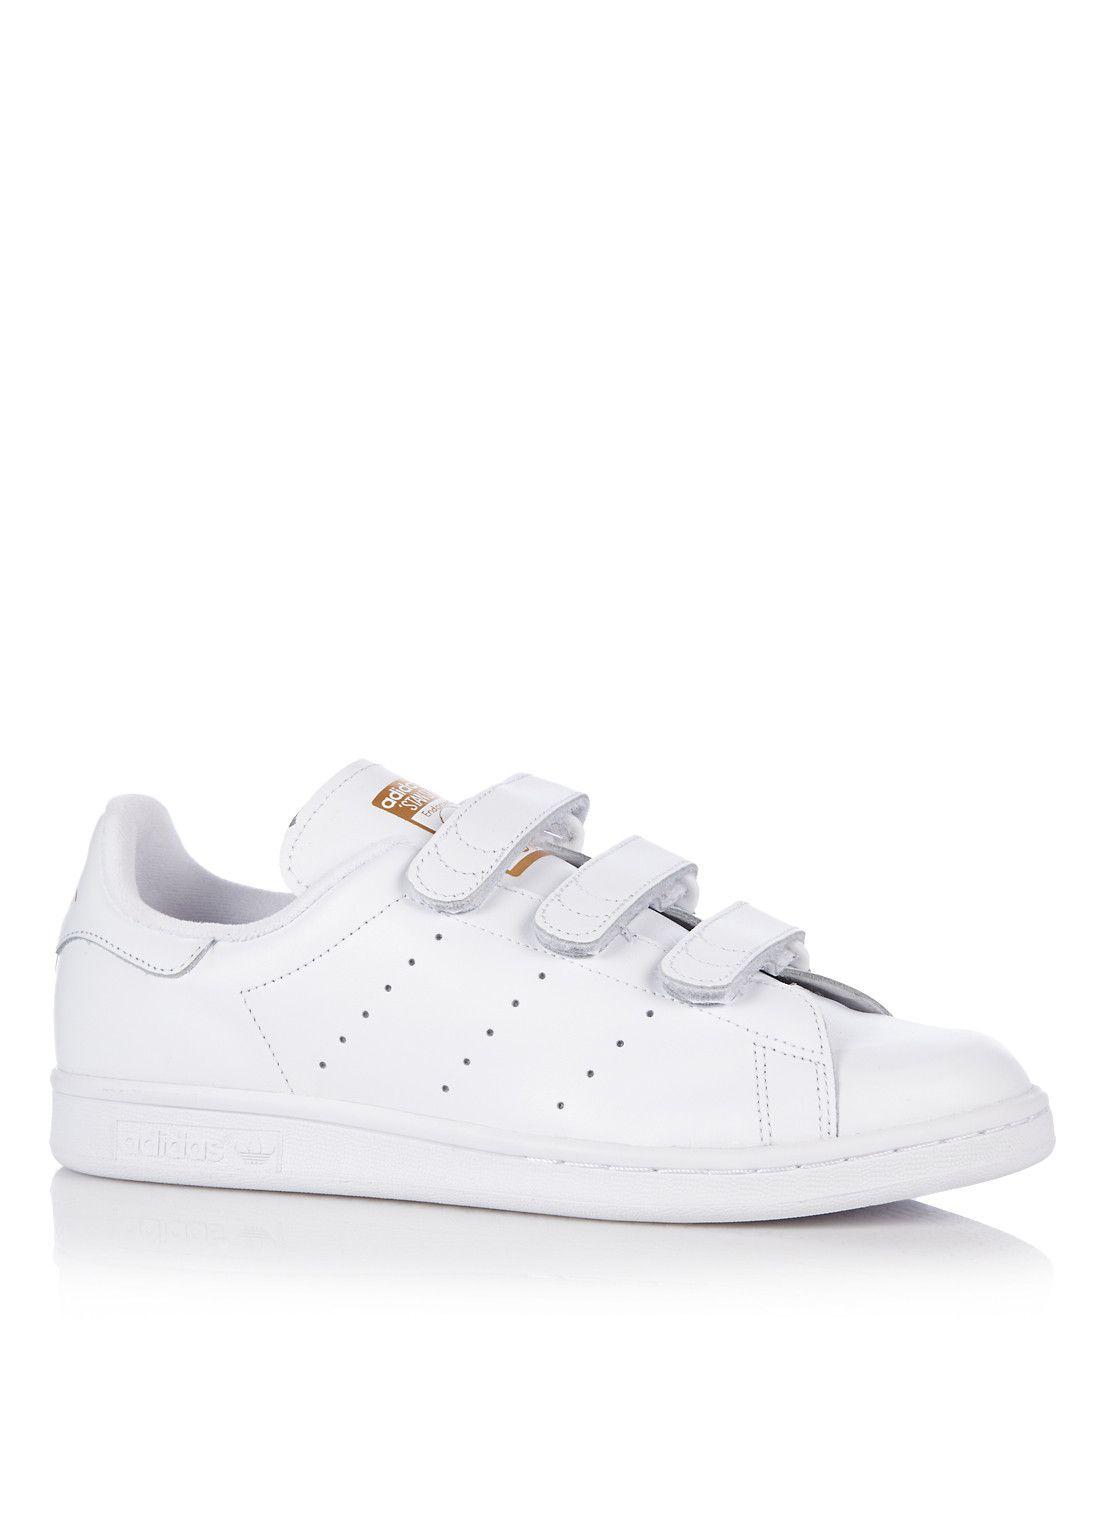 Adidas Stan Smith Velcro € 95,00